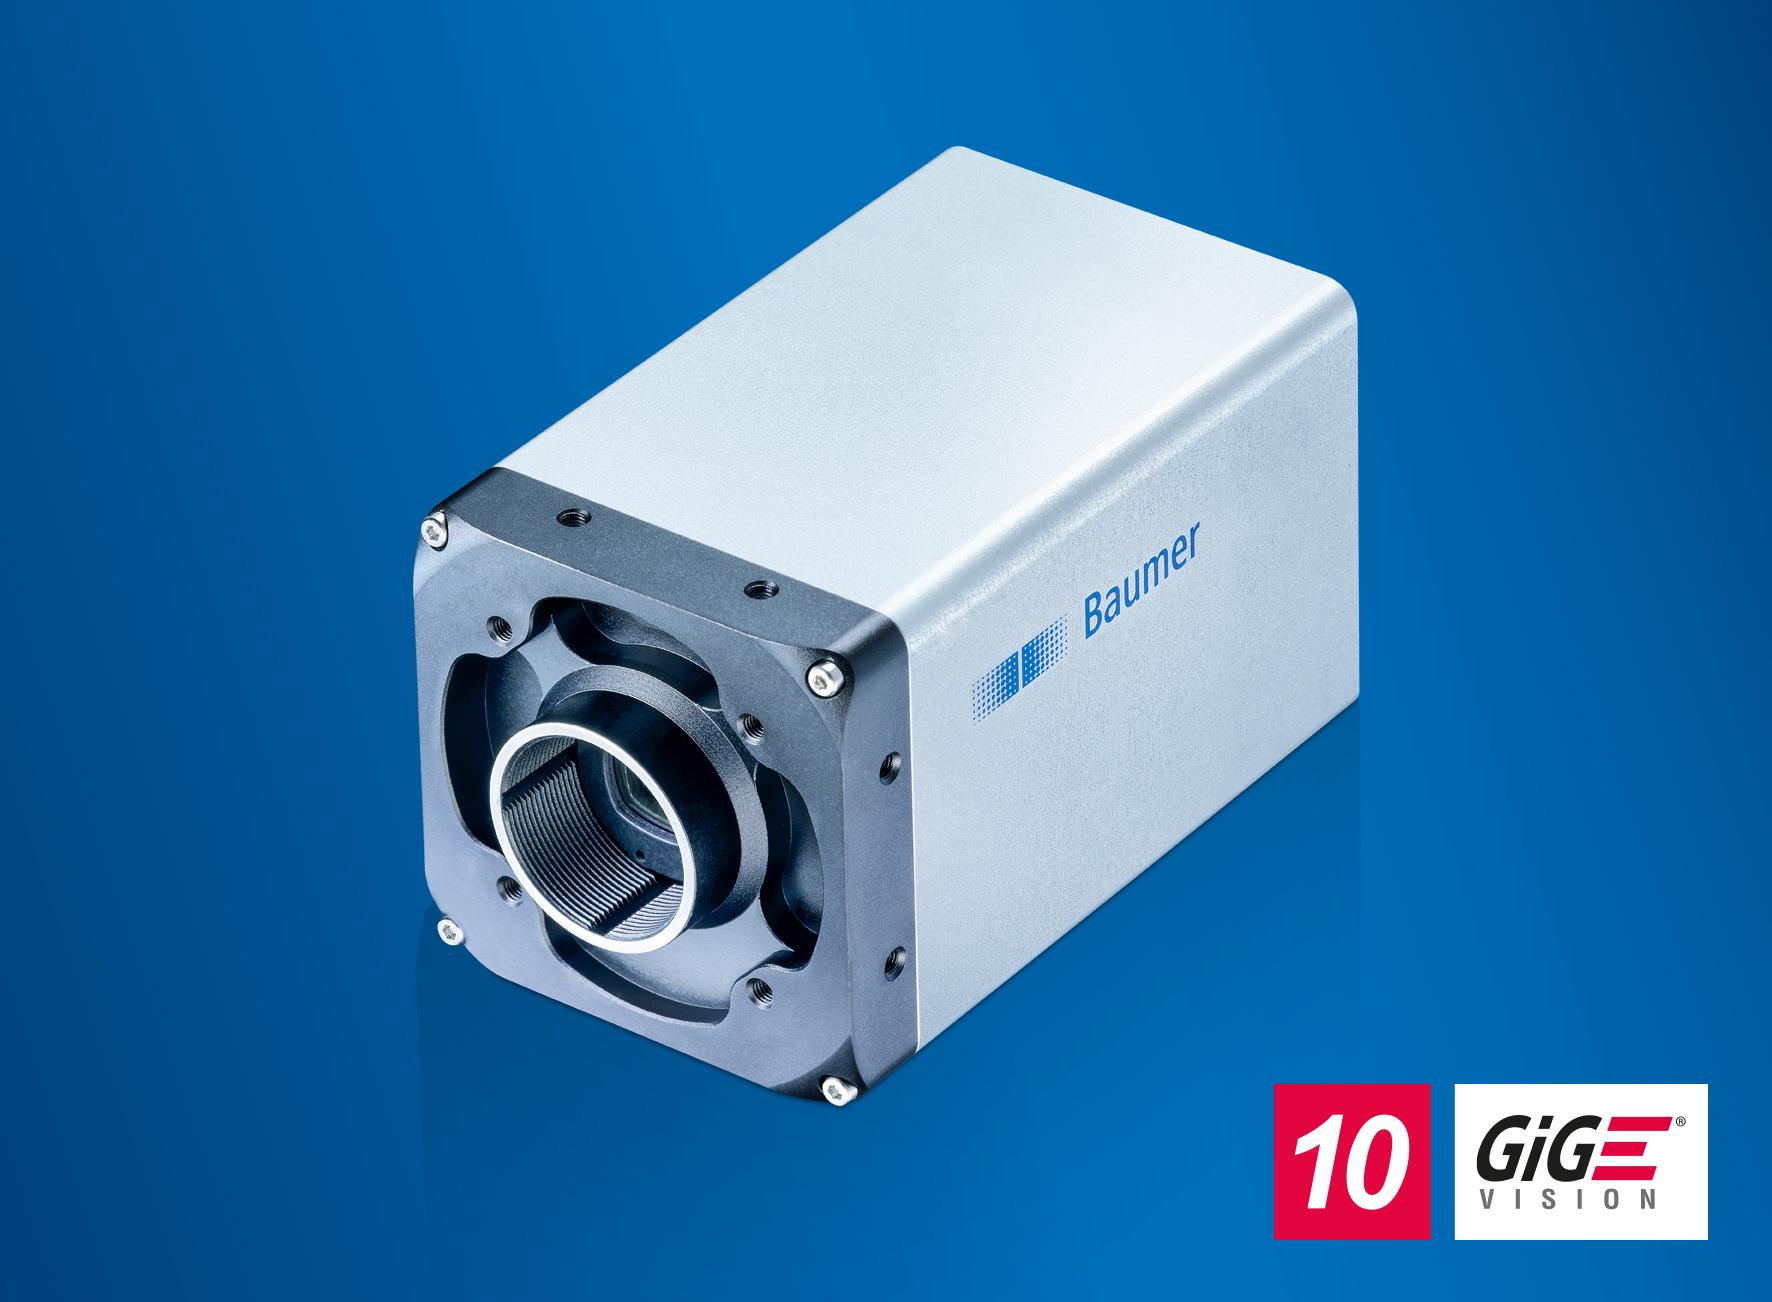 Baumer-LXT-Sony-Gen3-ML-20200310-PH